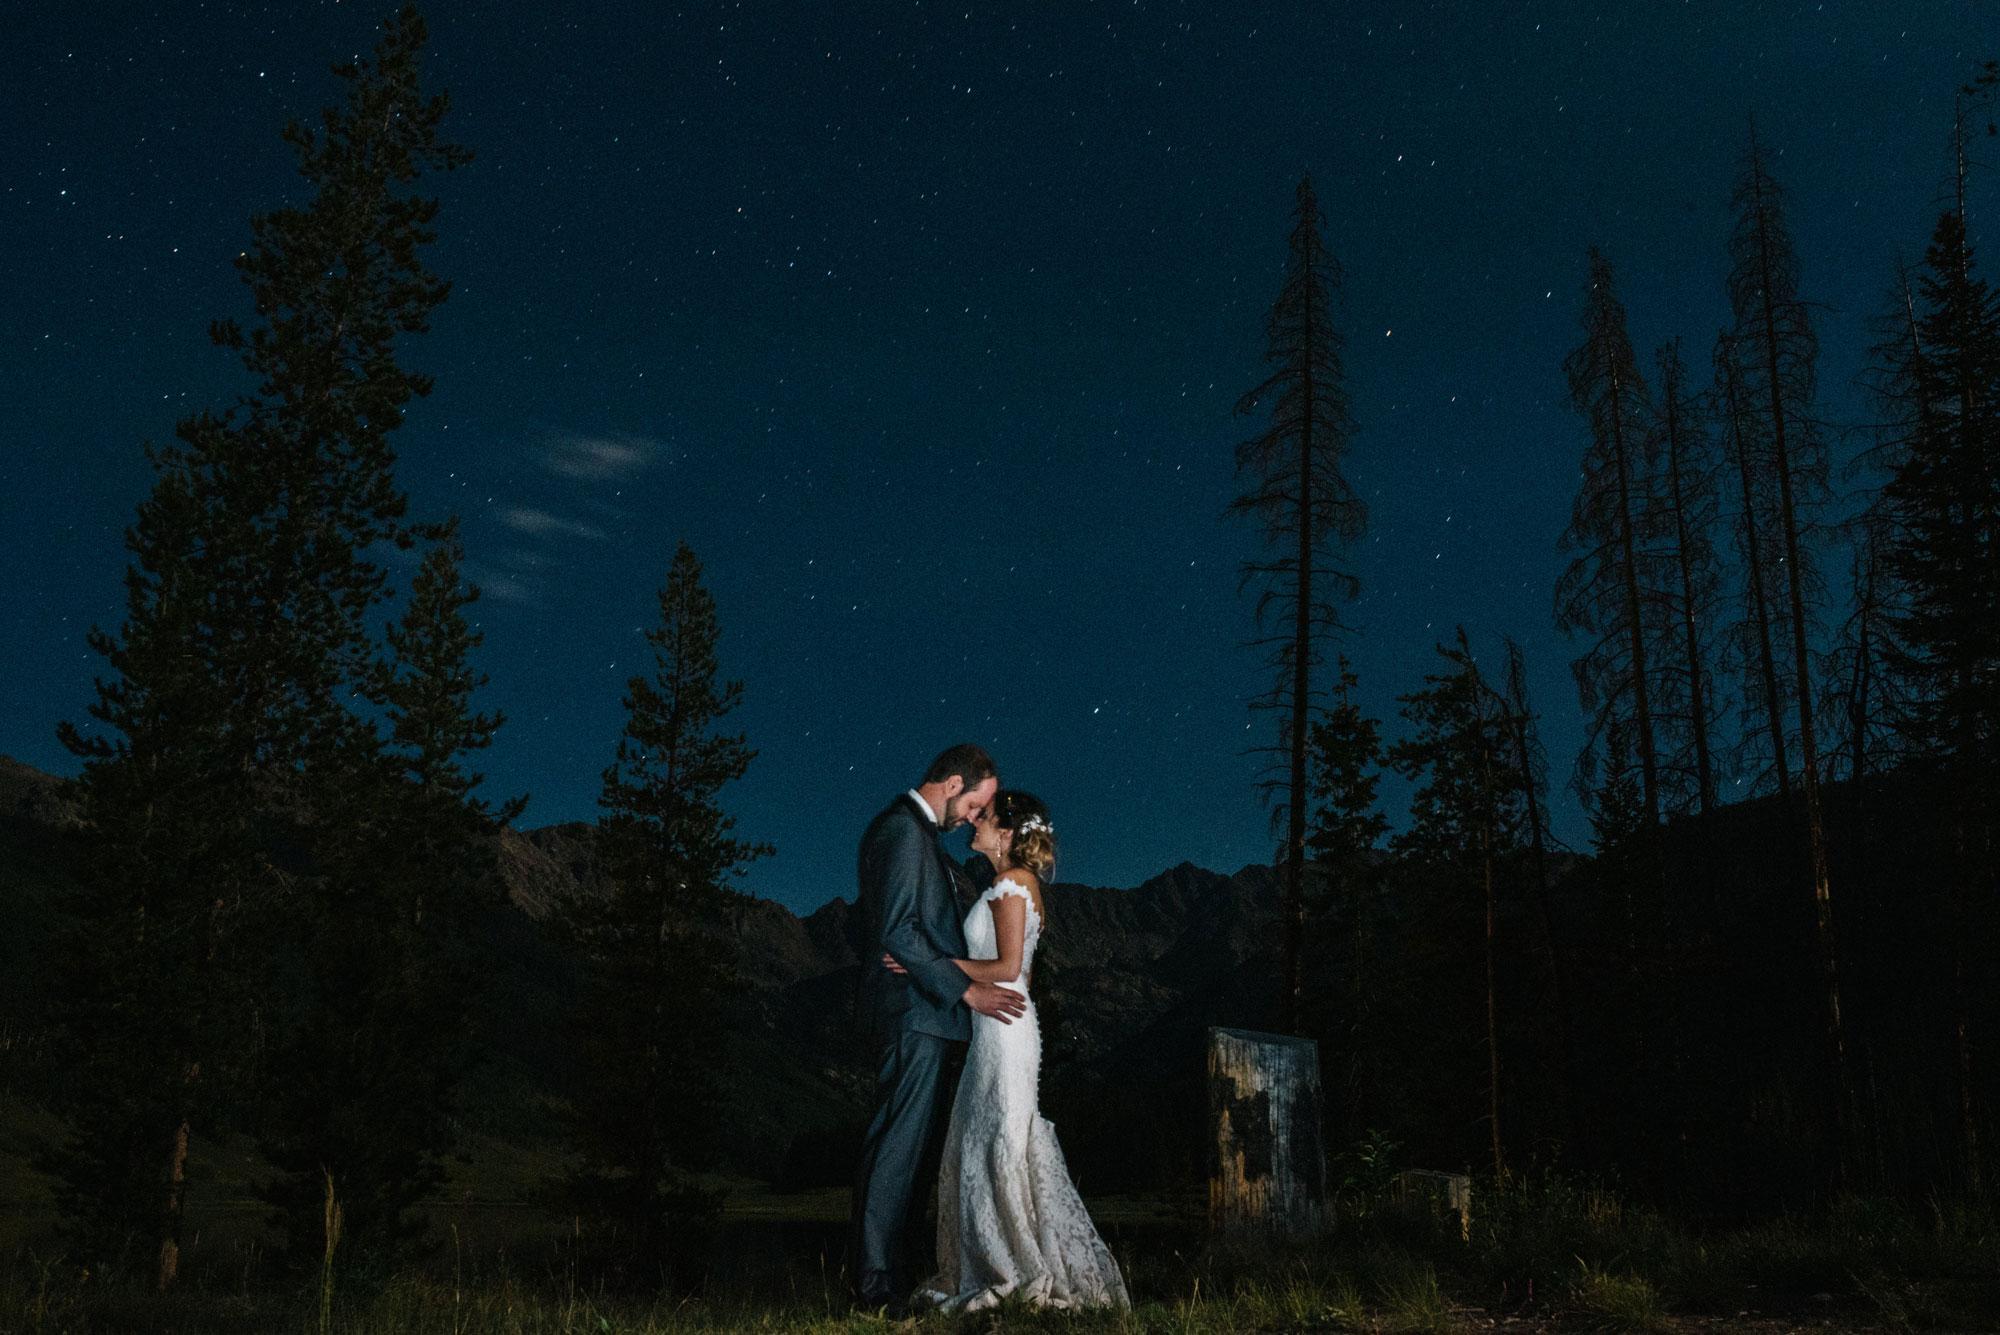 A Celestial Inspired Wedding in Vail, Colorado